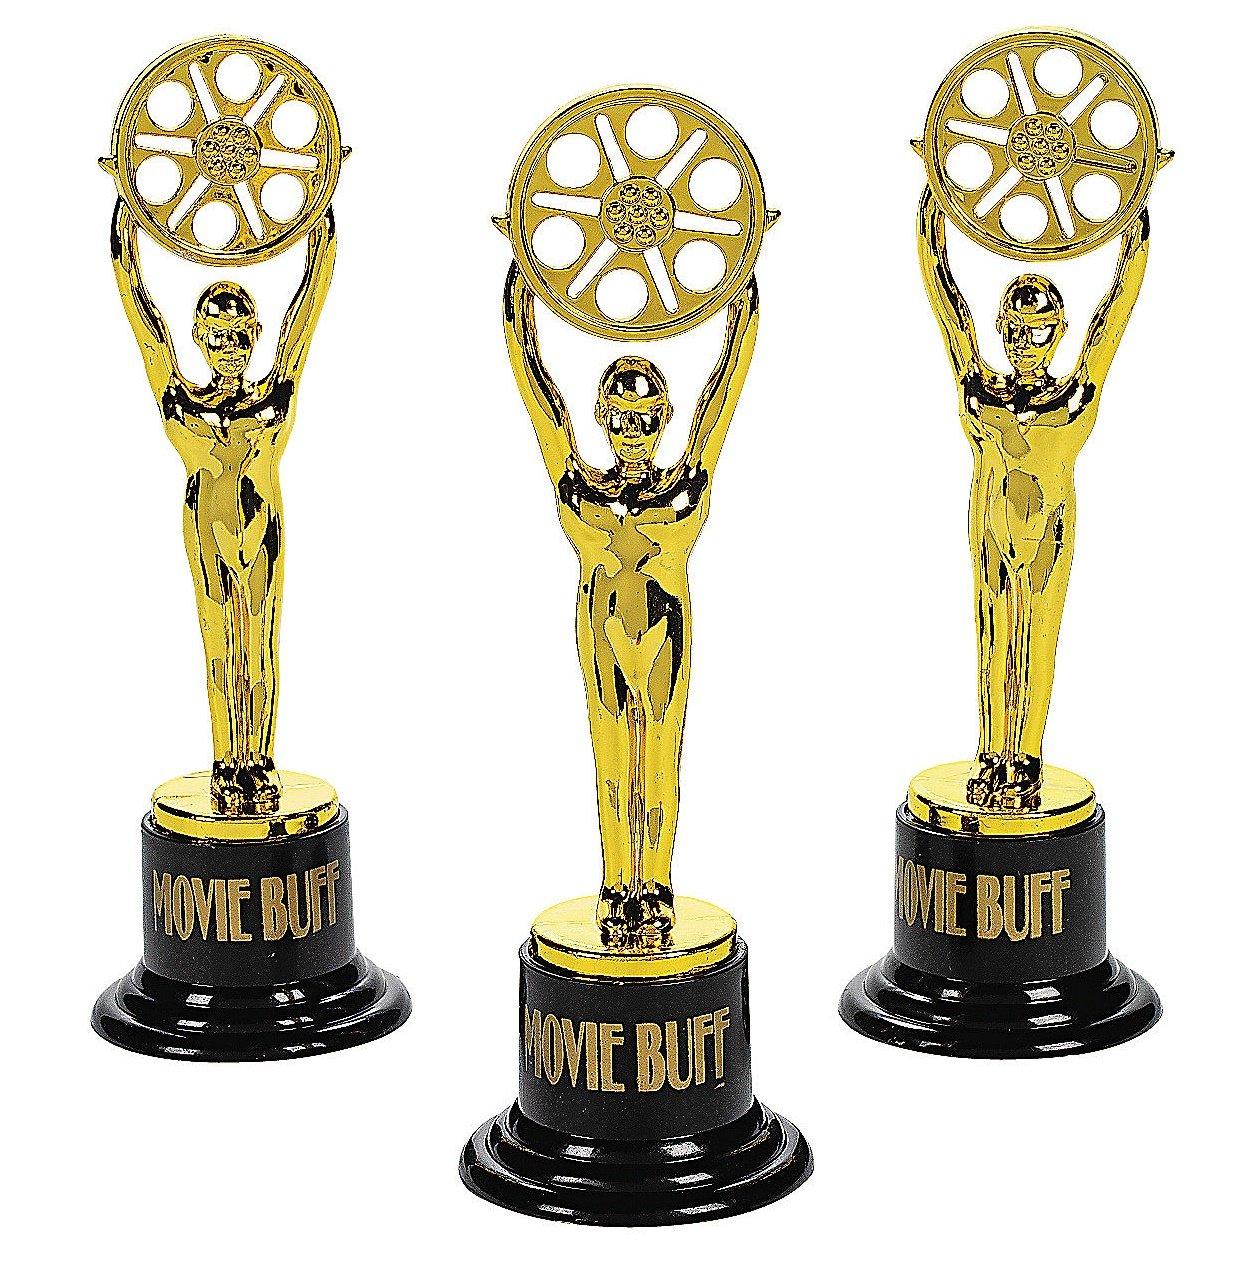 Movie Buff Gold Trophies (1 dz) by Fun Express